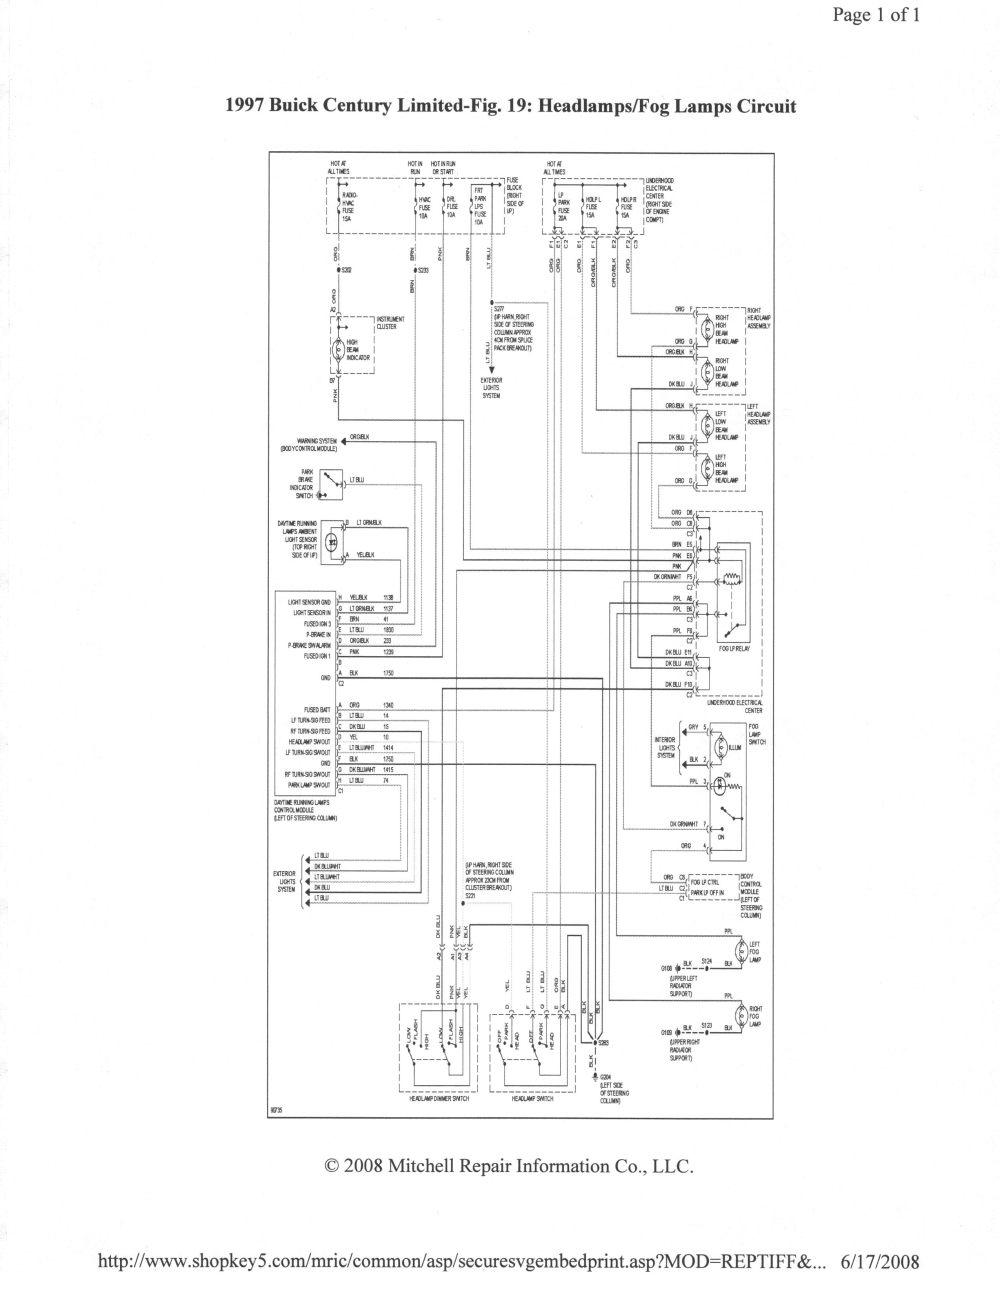 medium resolution of wrg 9303 2002 buick regal stereo wiring diagram2002 buick regal stereo wiring diagram trusted wiring